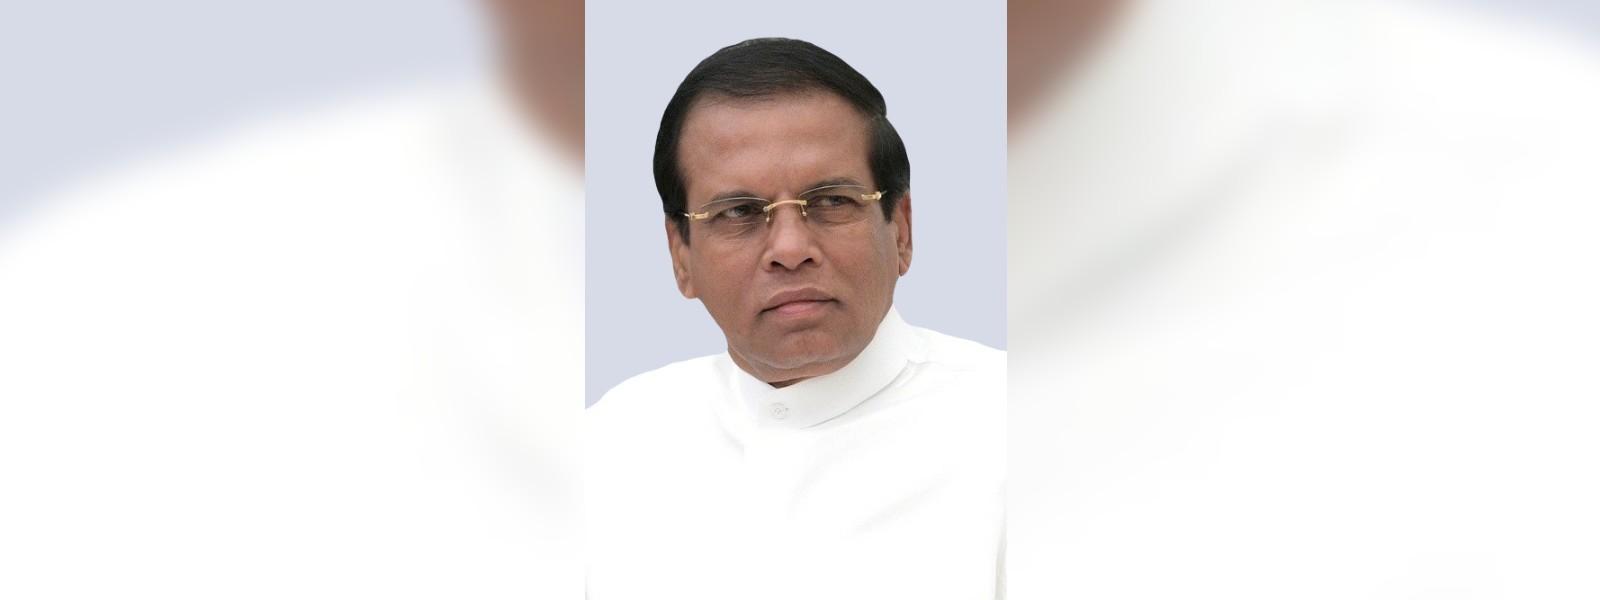 Ex-President at PCoI